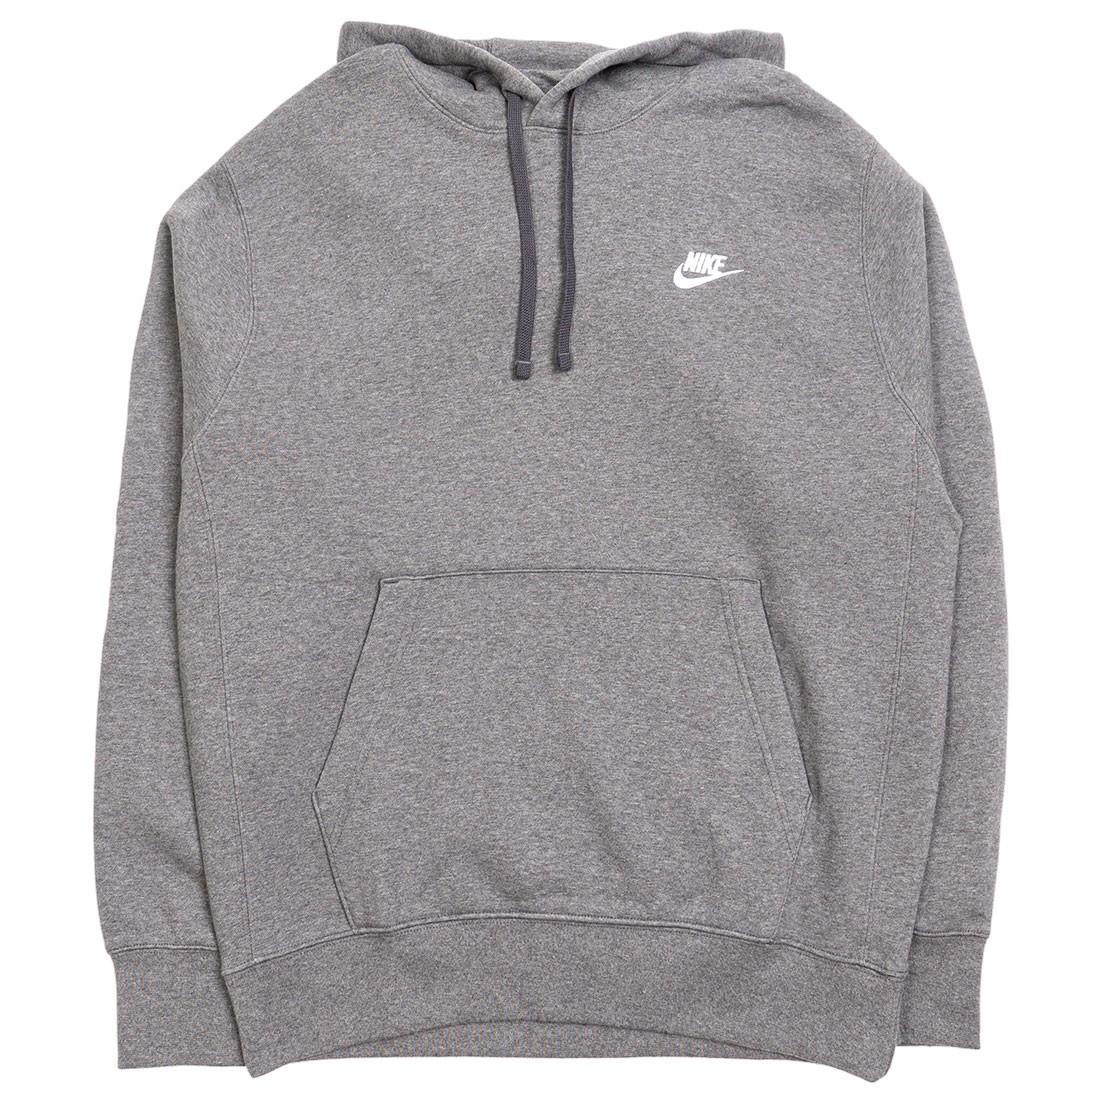 Nike Men Sportswear Club Fleece Hoody (charcoal heathr / anthracite / white)